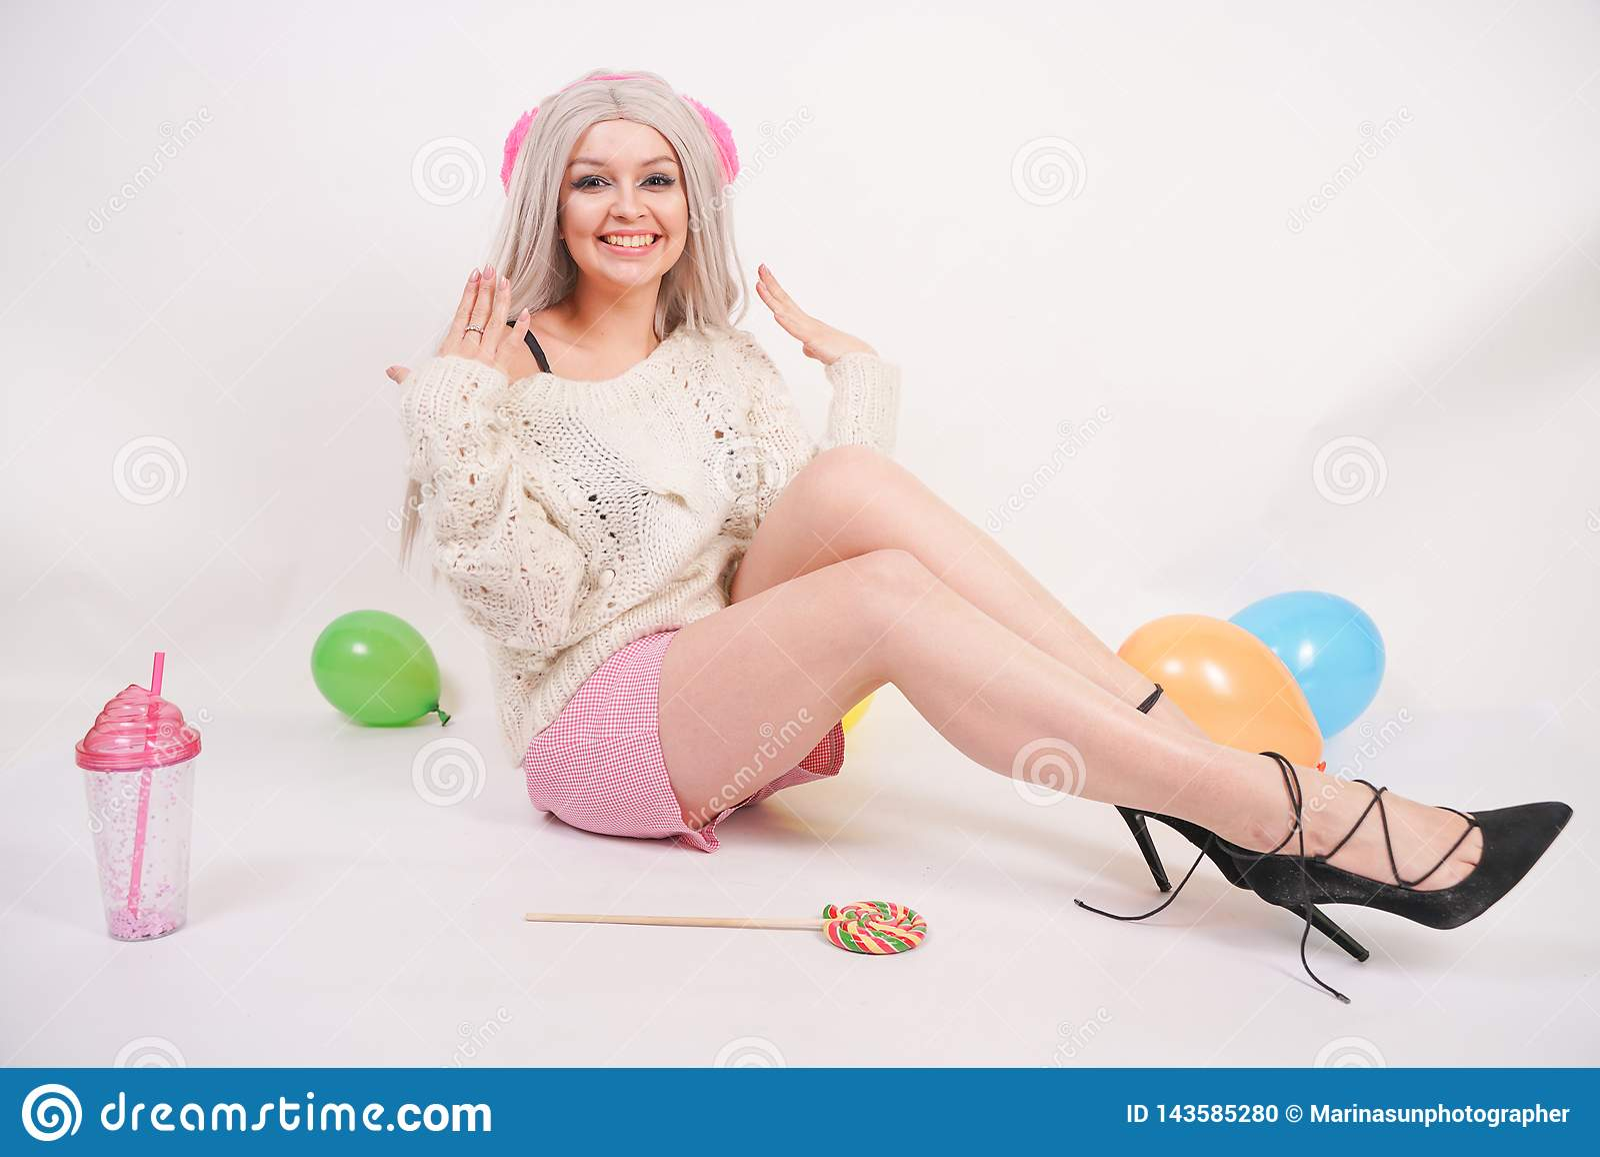 Chubby blonde teen shower